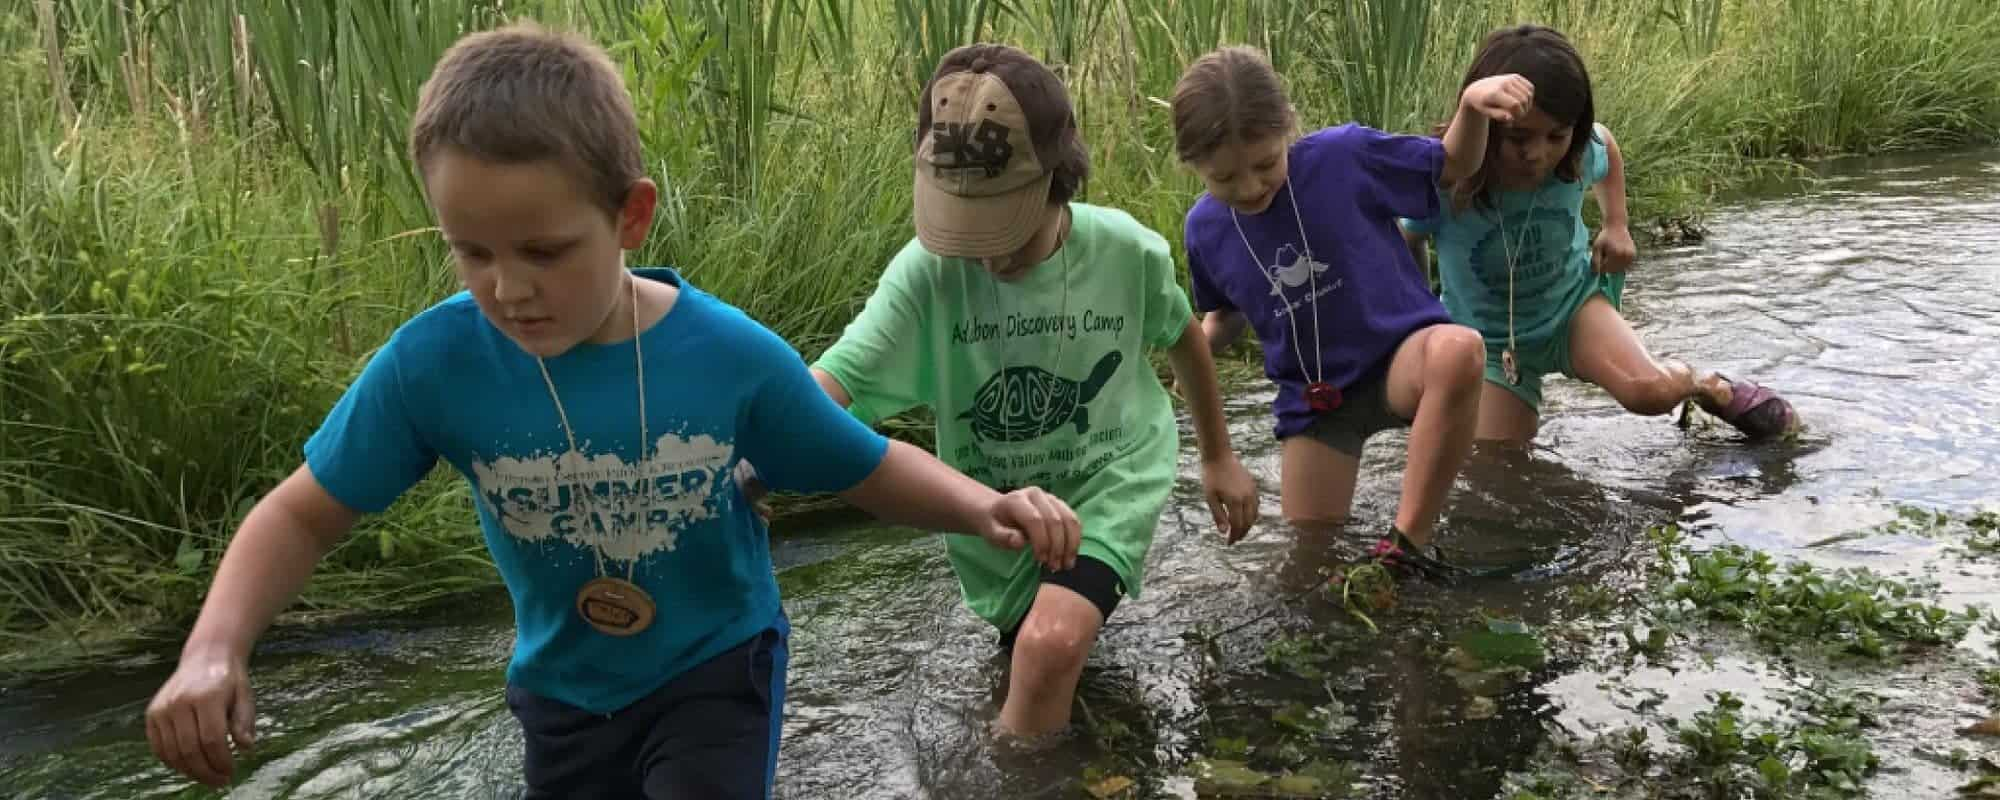 Camp kids wading in creek